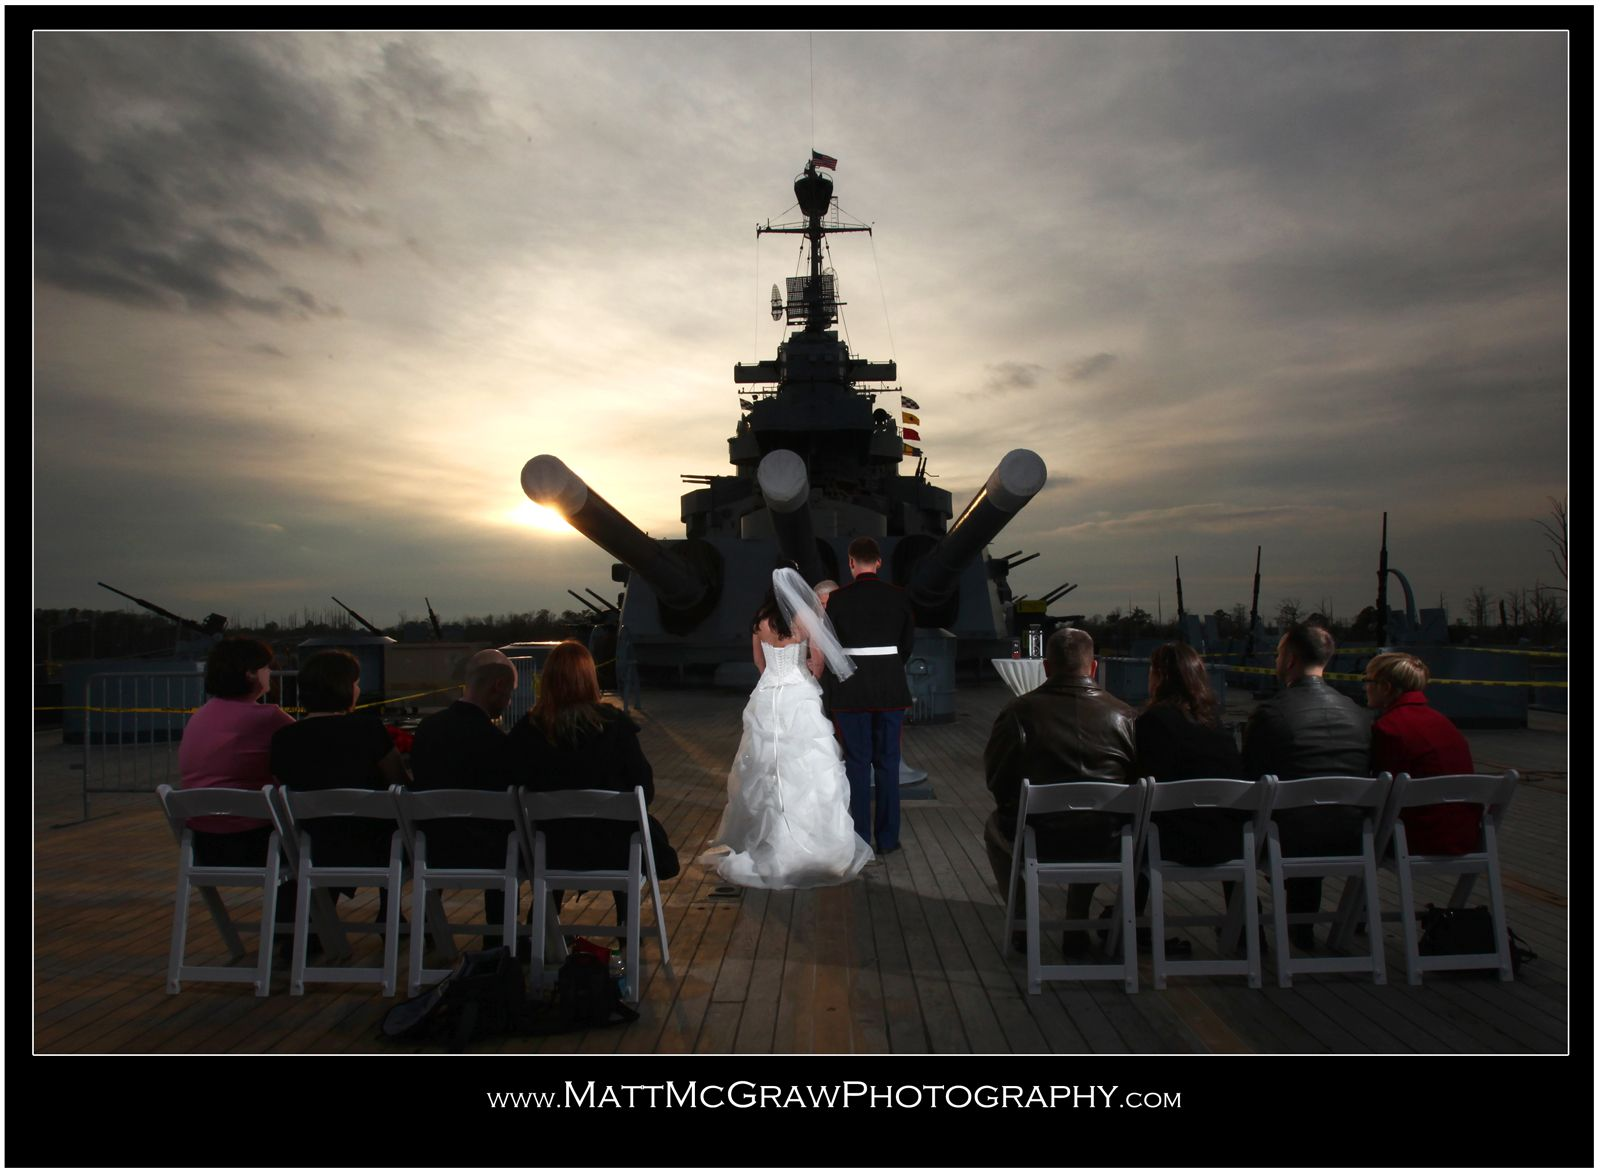 nc battleship wedding venue?